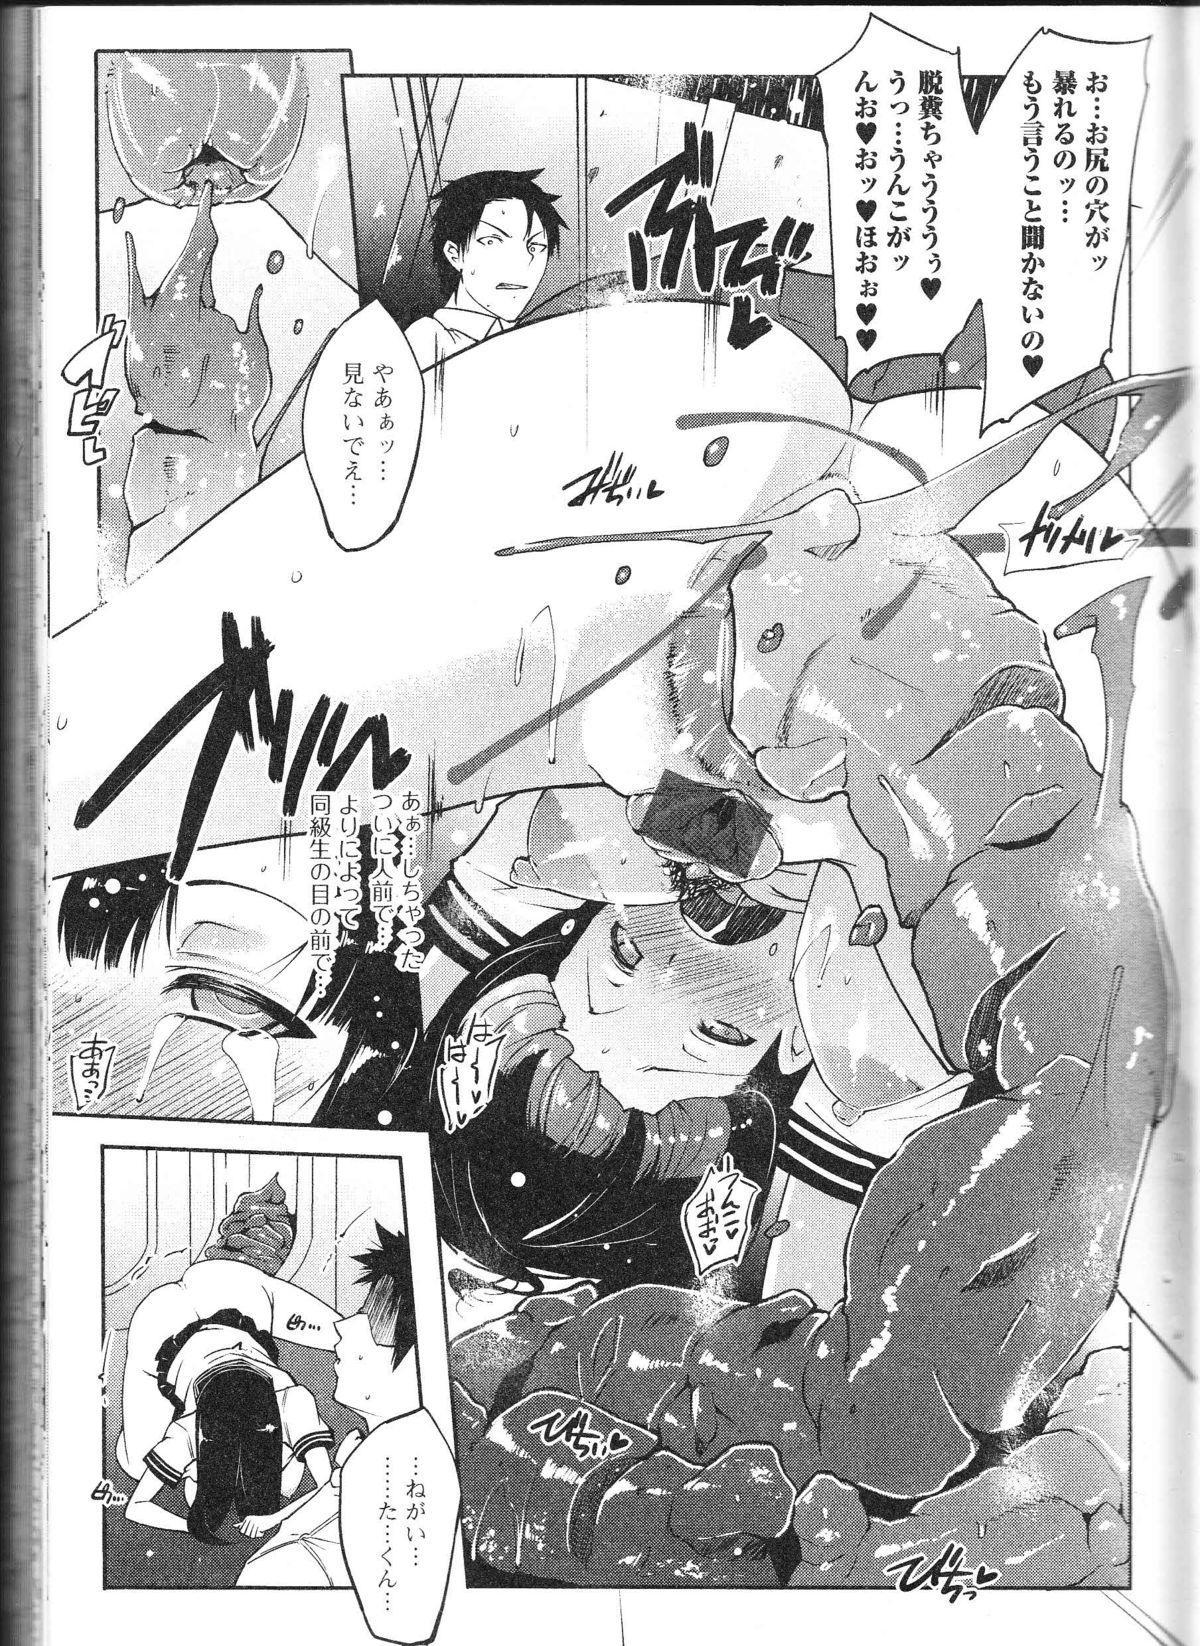 Nozoite wa Ikenai 9 - Do Not Peep! 9 75